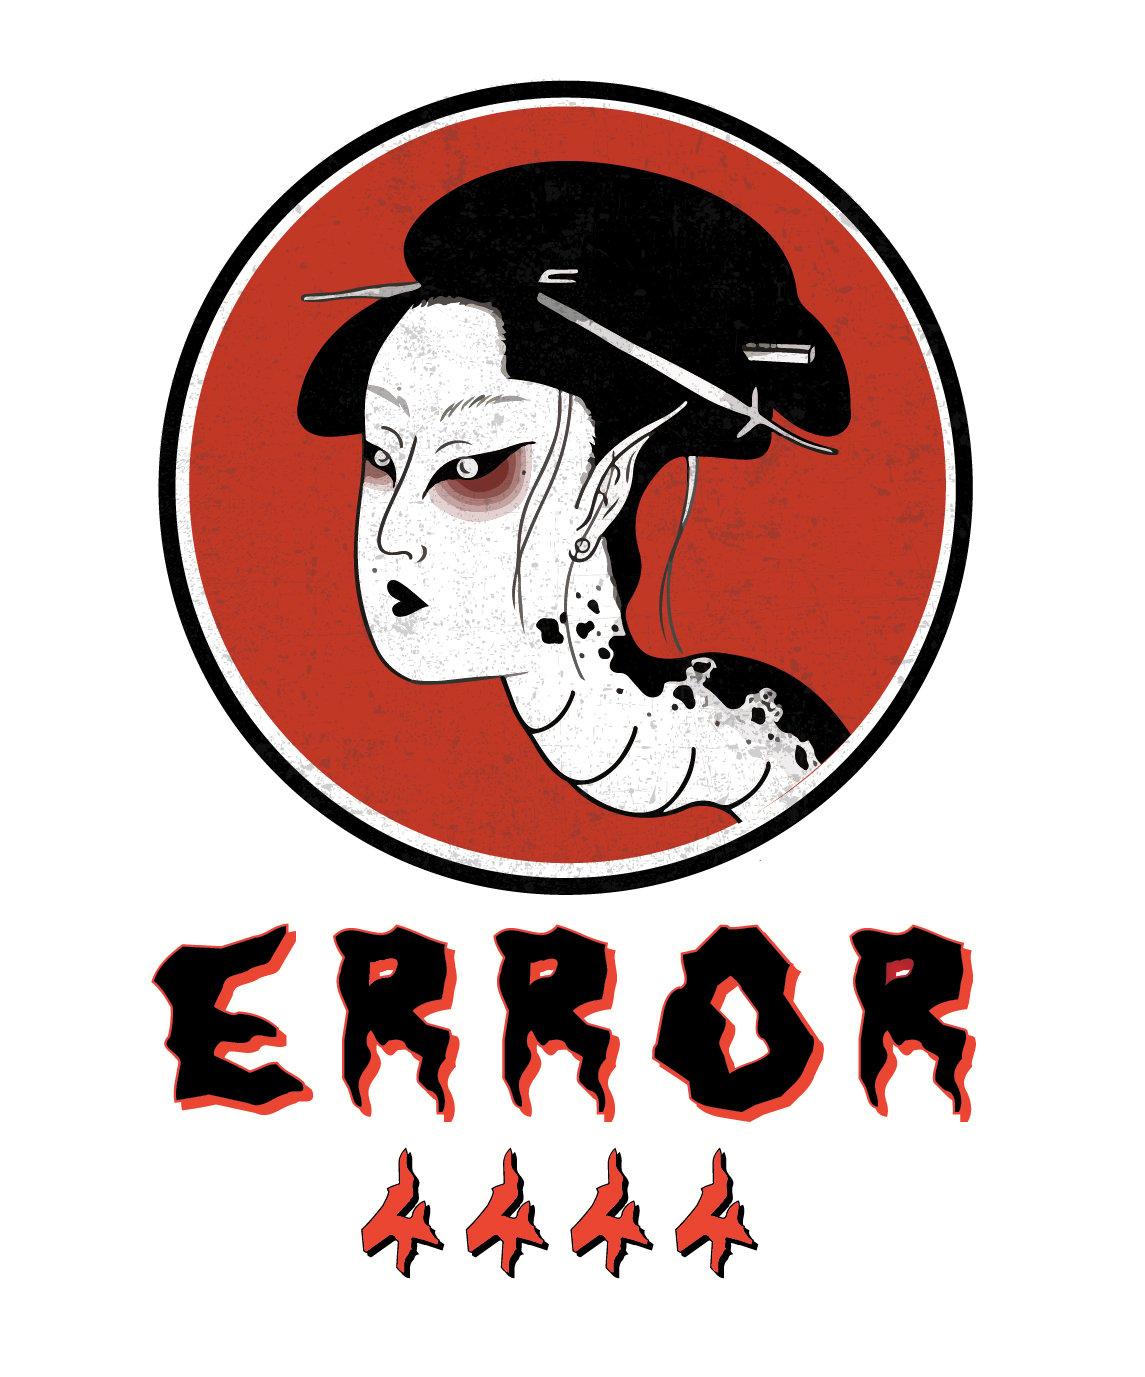 Error 4444 Home